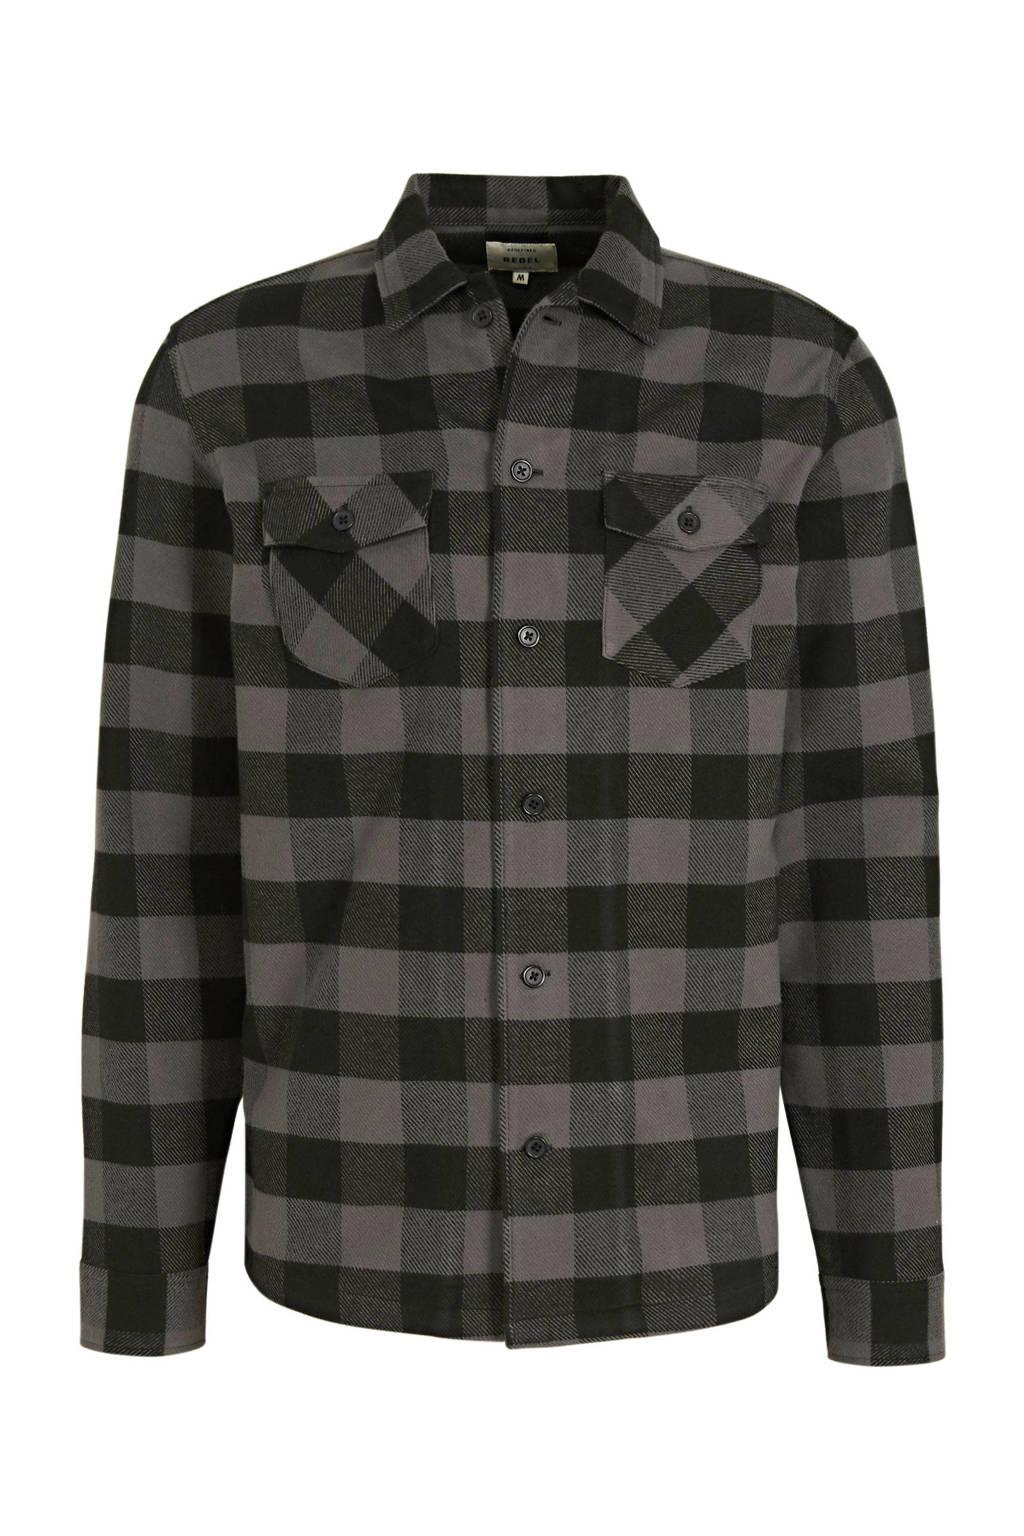 Redefined Rebel geruit regular fit overhemd Jerry  grijs/zwart, Grijs/zwart